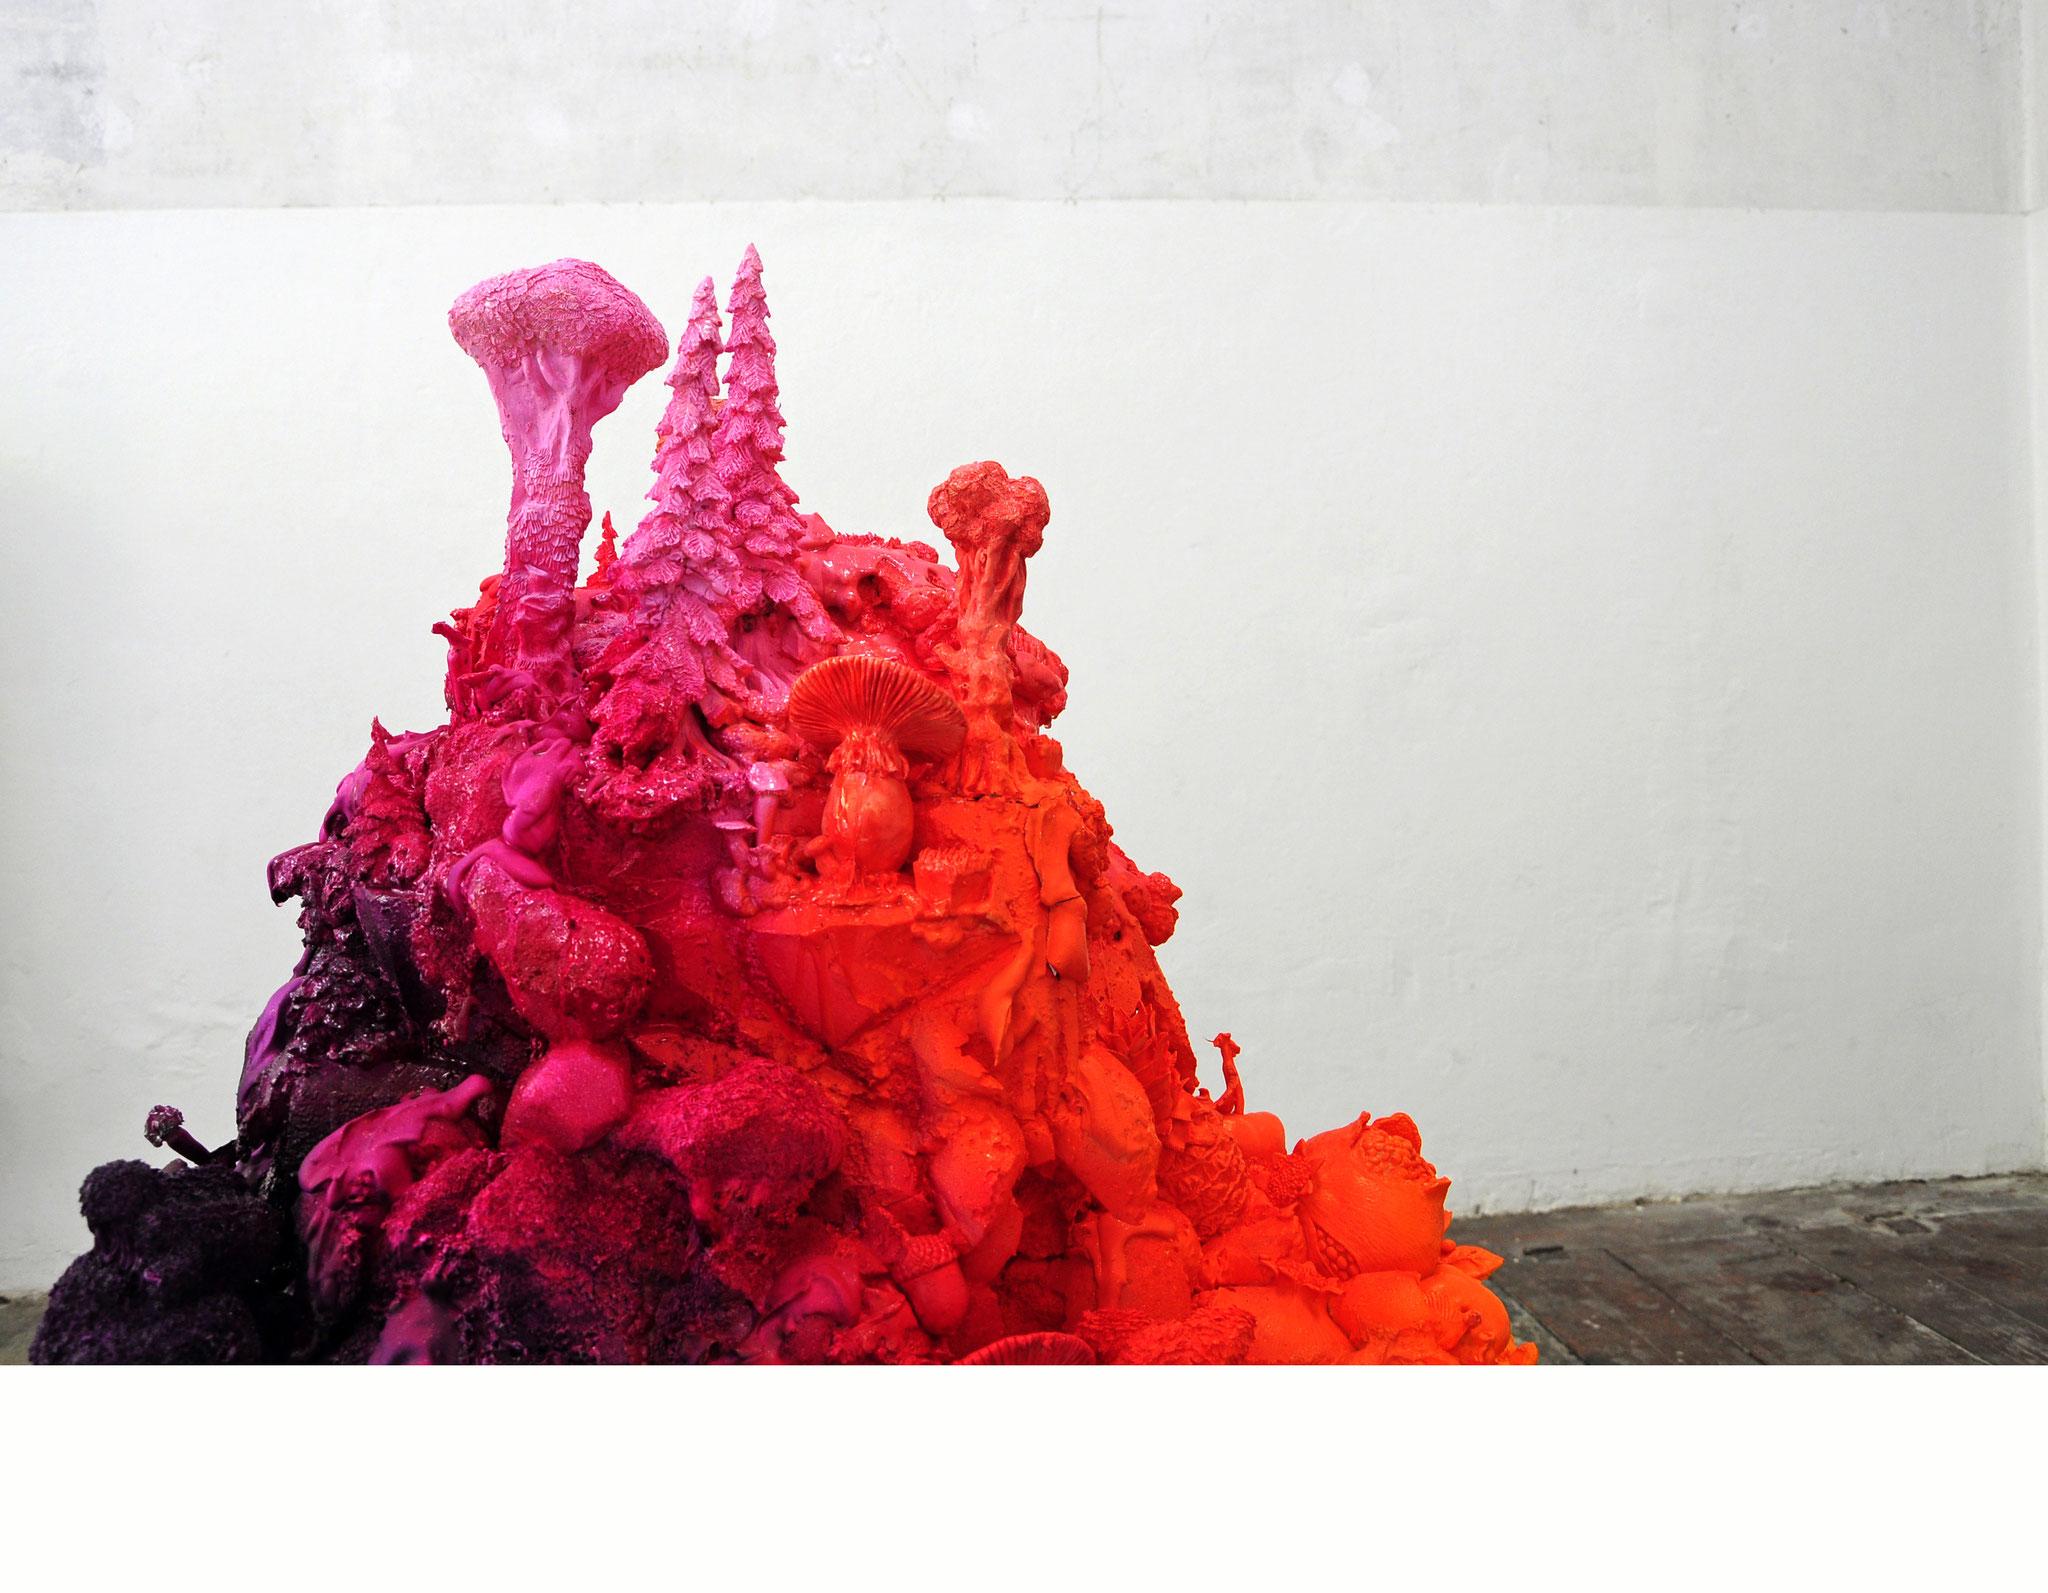 """Und irgendwo im Wald lacht ein Fuchs"" (Detail), 2017, polymer, styropor, PU-foam, plaster, color, 120x100x70cm (Foto: Mareike Jacobi)"